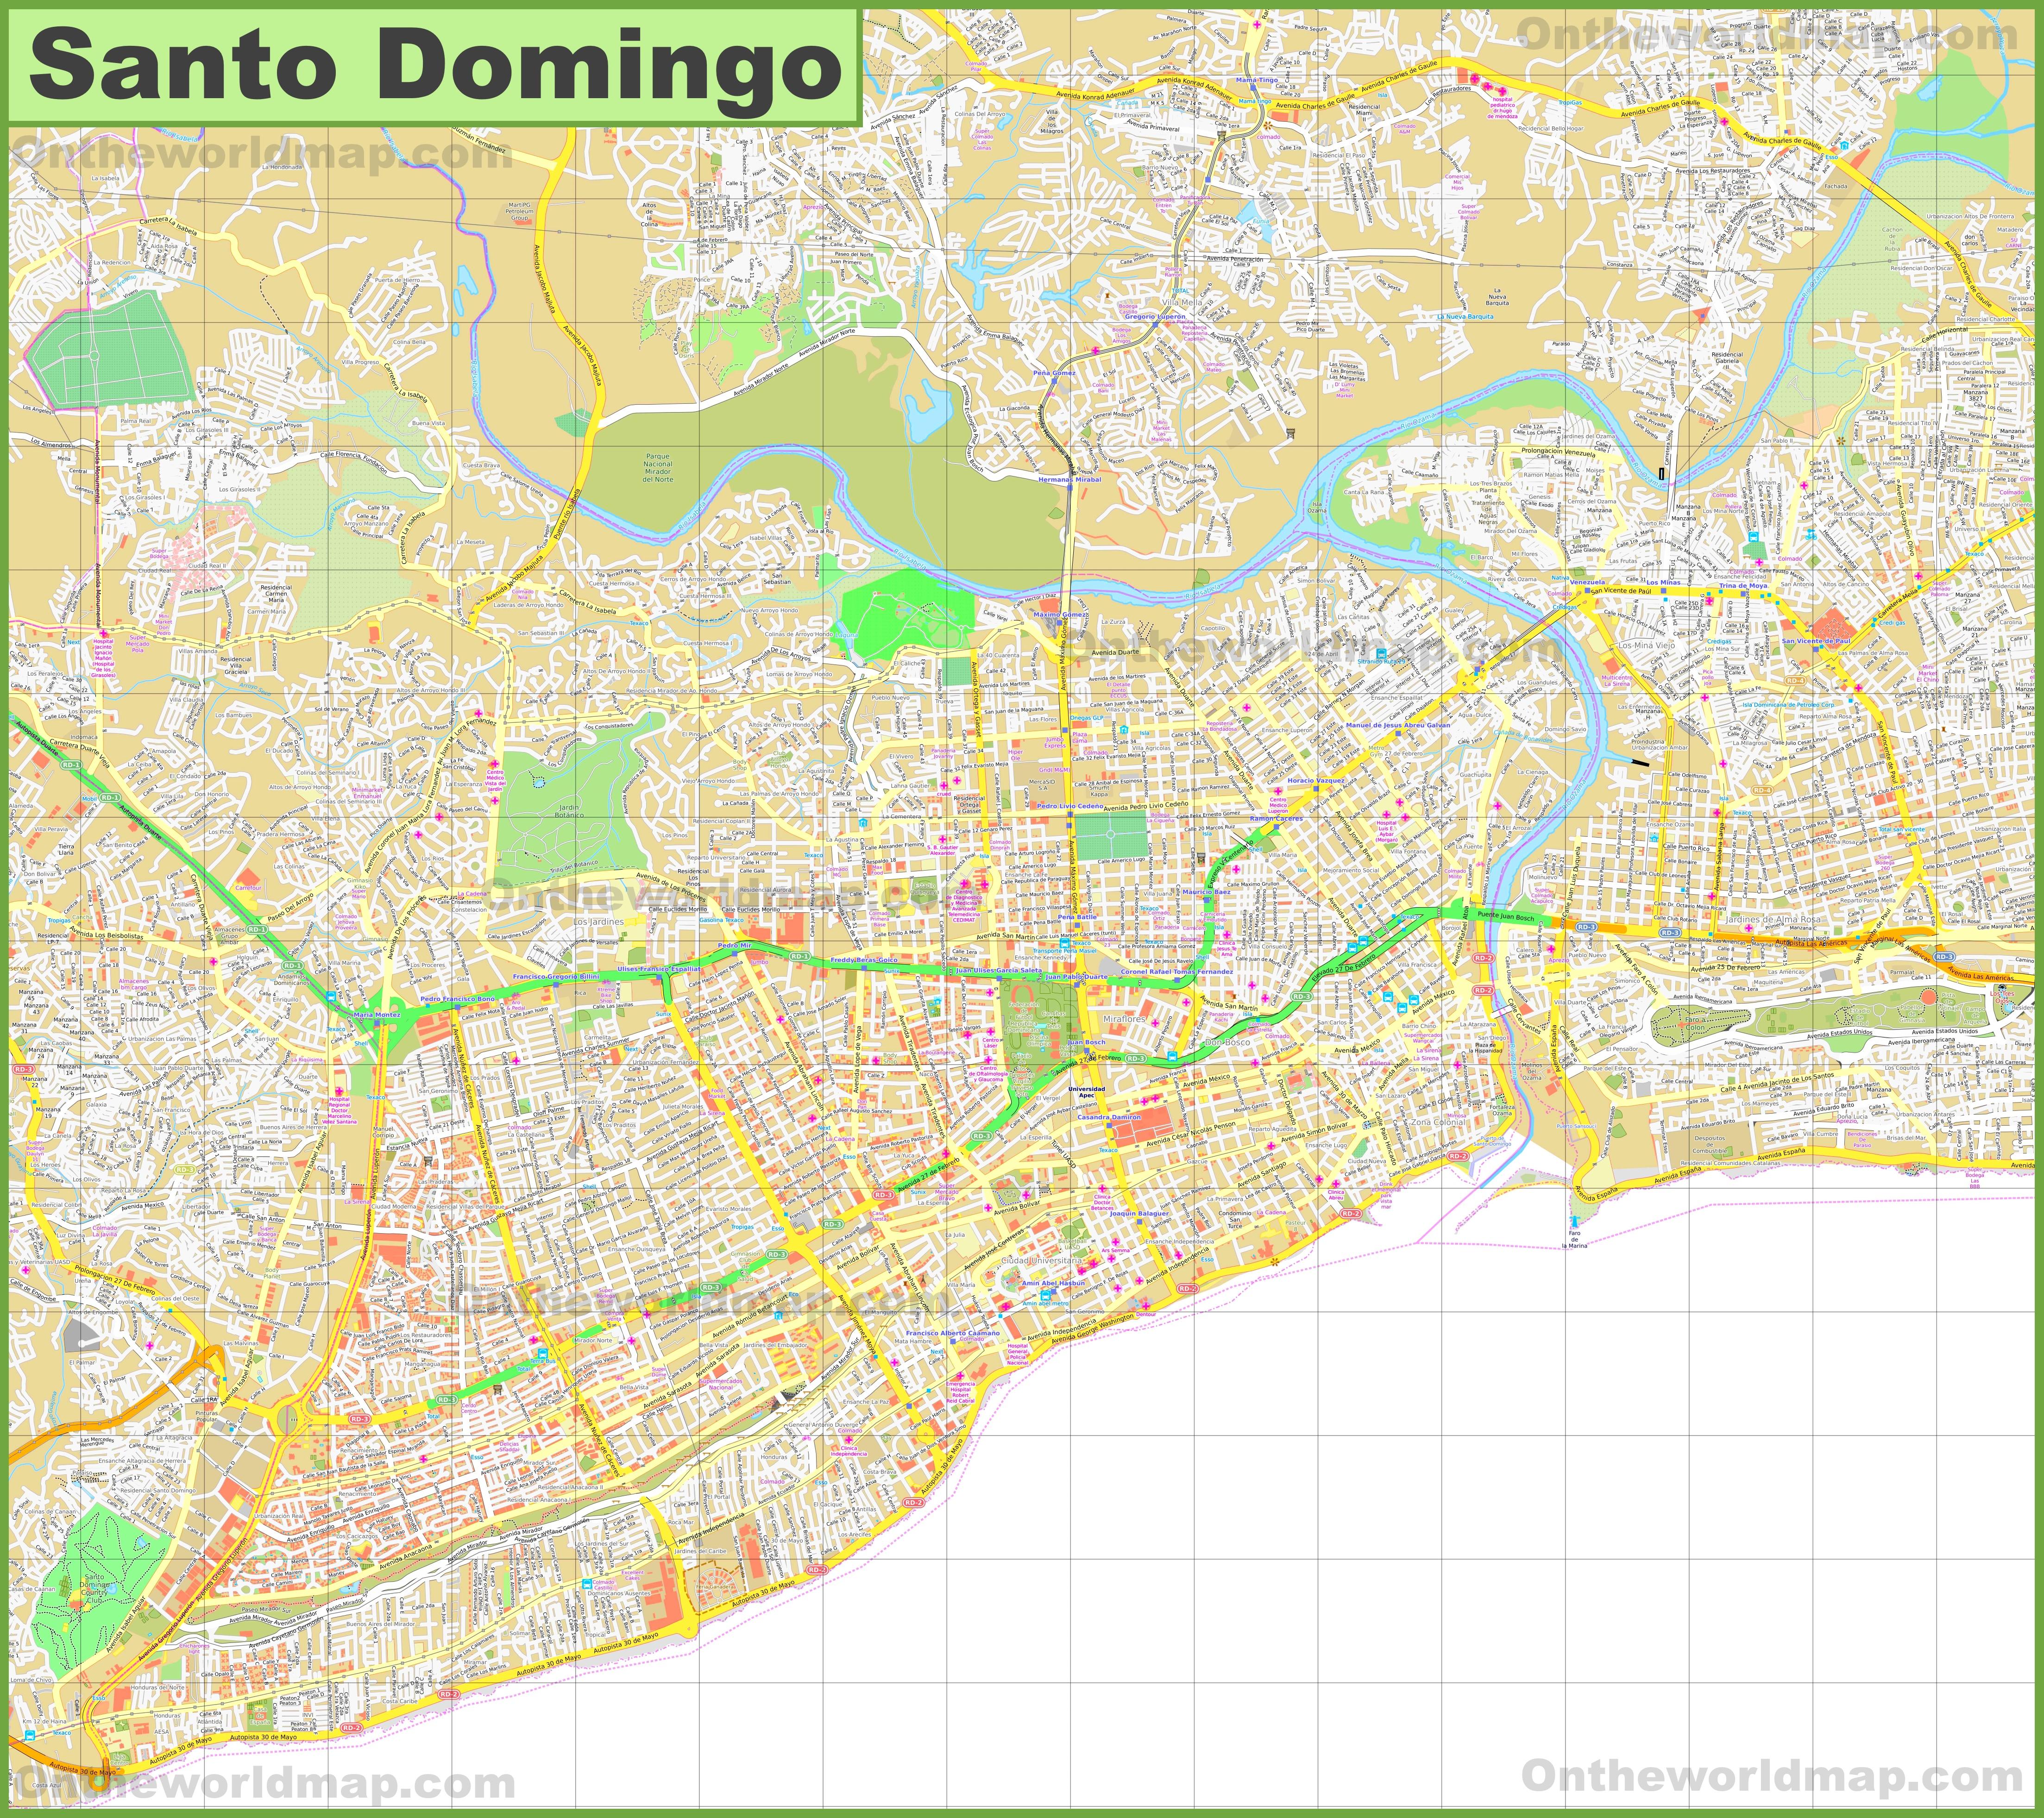 Large detailed map of Santo Domingo on managua map, la romana map, yucatan peninsula map, san salvador map, el salvador map, la havana map, port au prince on map, saint-domingue map, jamaica map, dominican republic map, caribbean map, punta cana map, havana cuba map, san juan map, quito map, belmopan map, toronto map, haiti map, puerto rico map, caracas map,